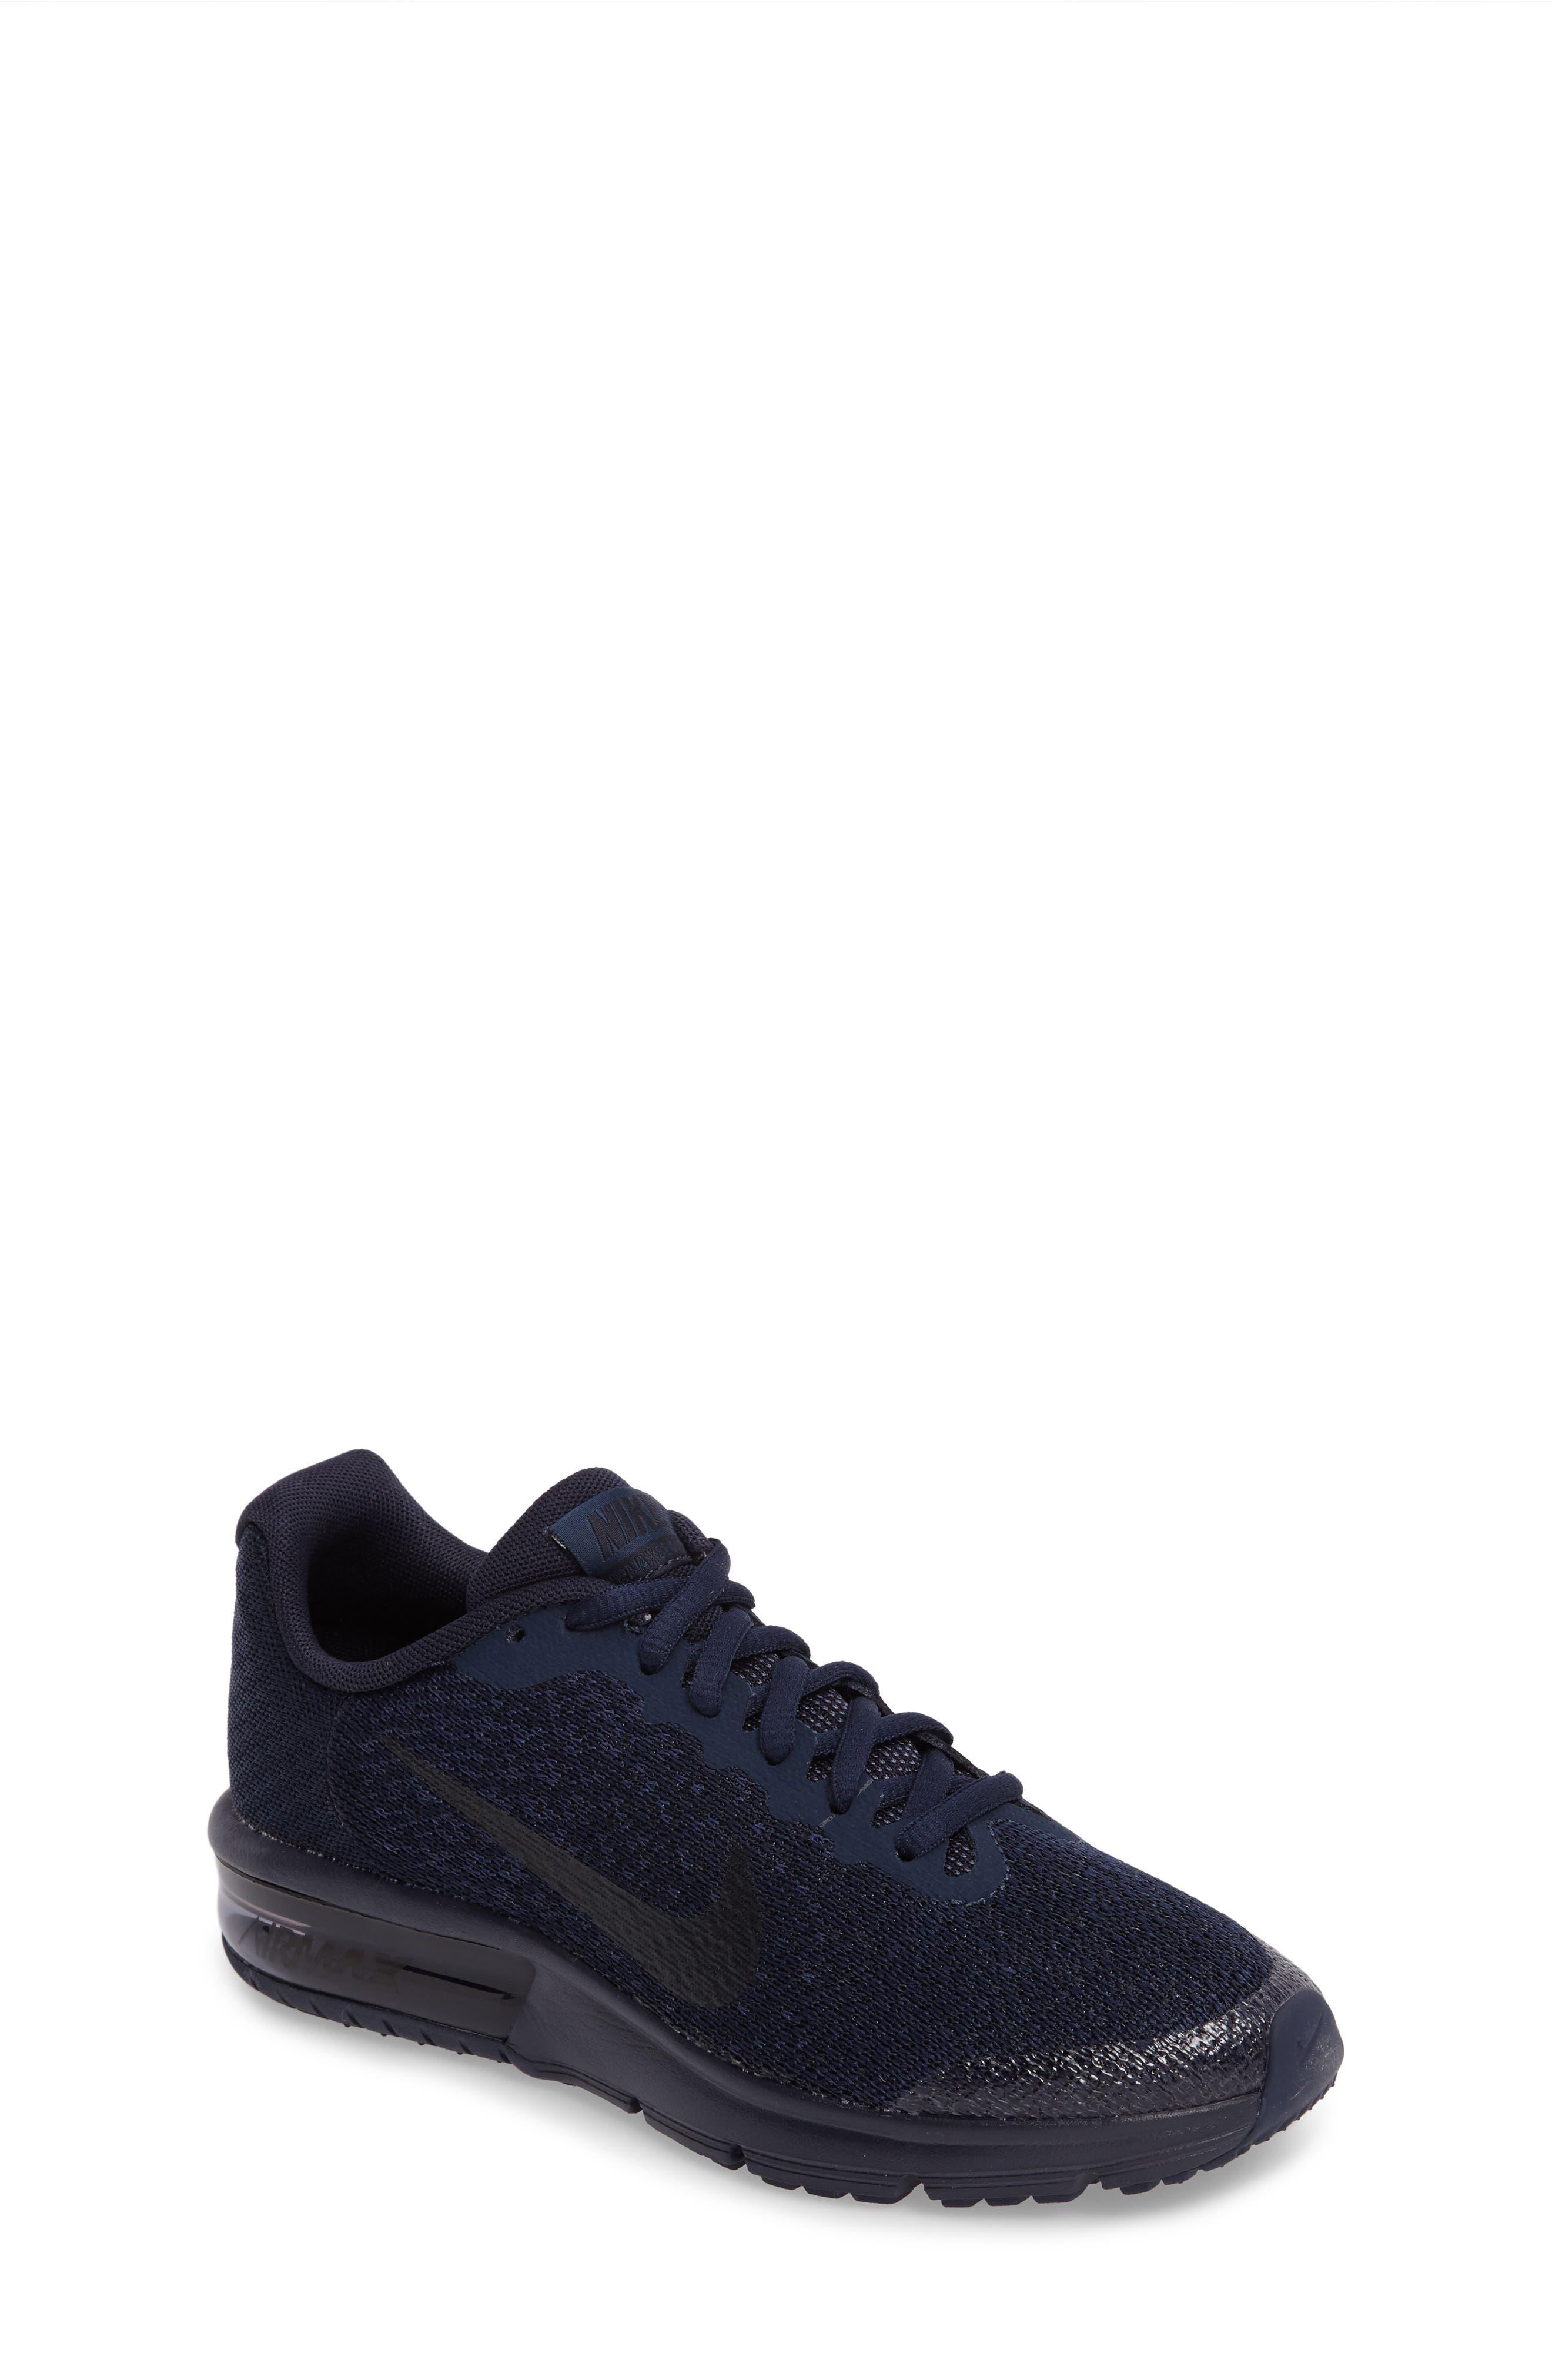 Nike Air Max Sequent 2 Sneaker (Big Kid)